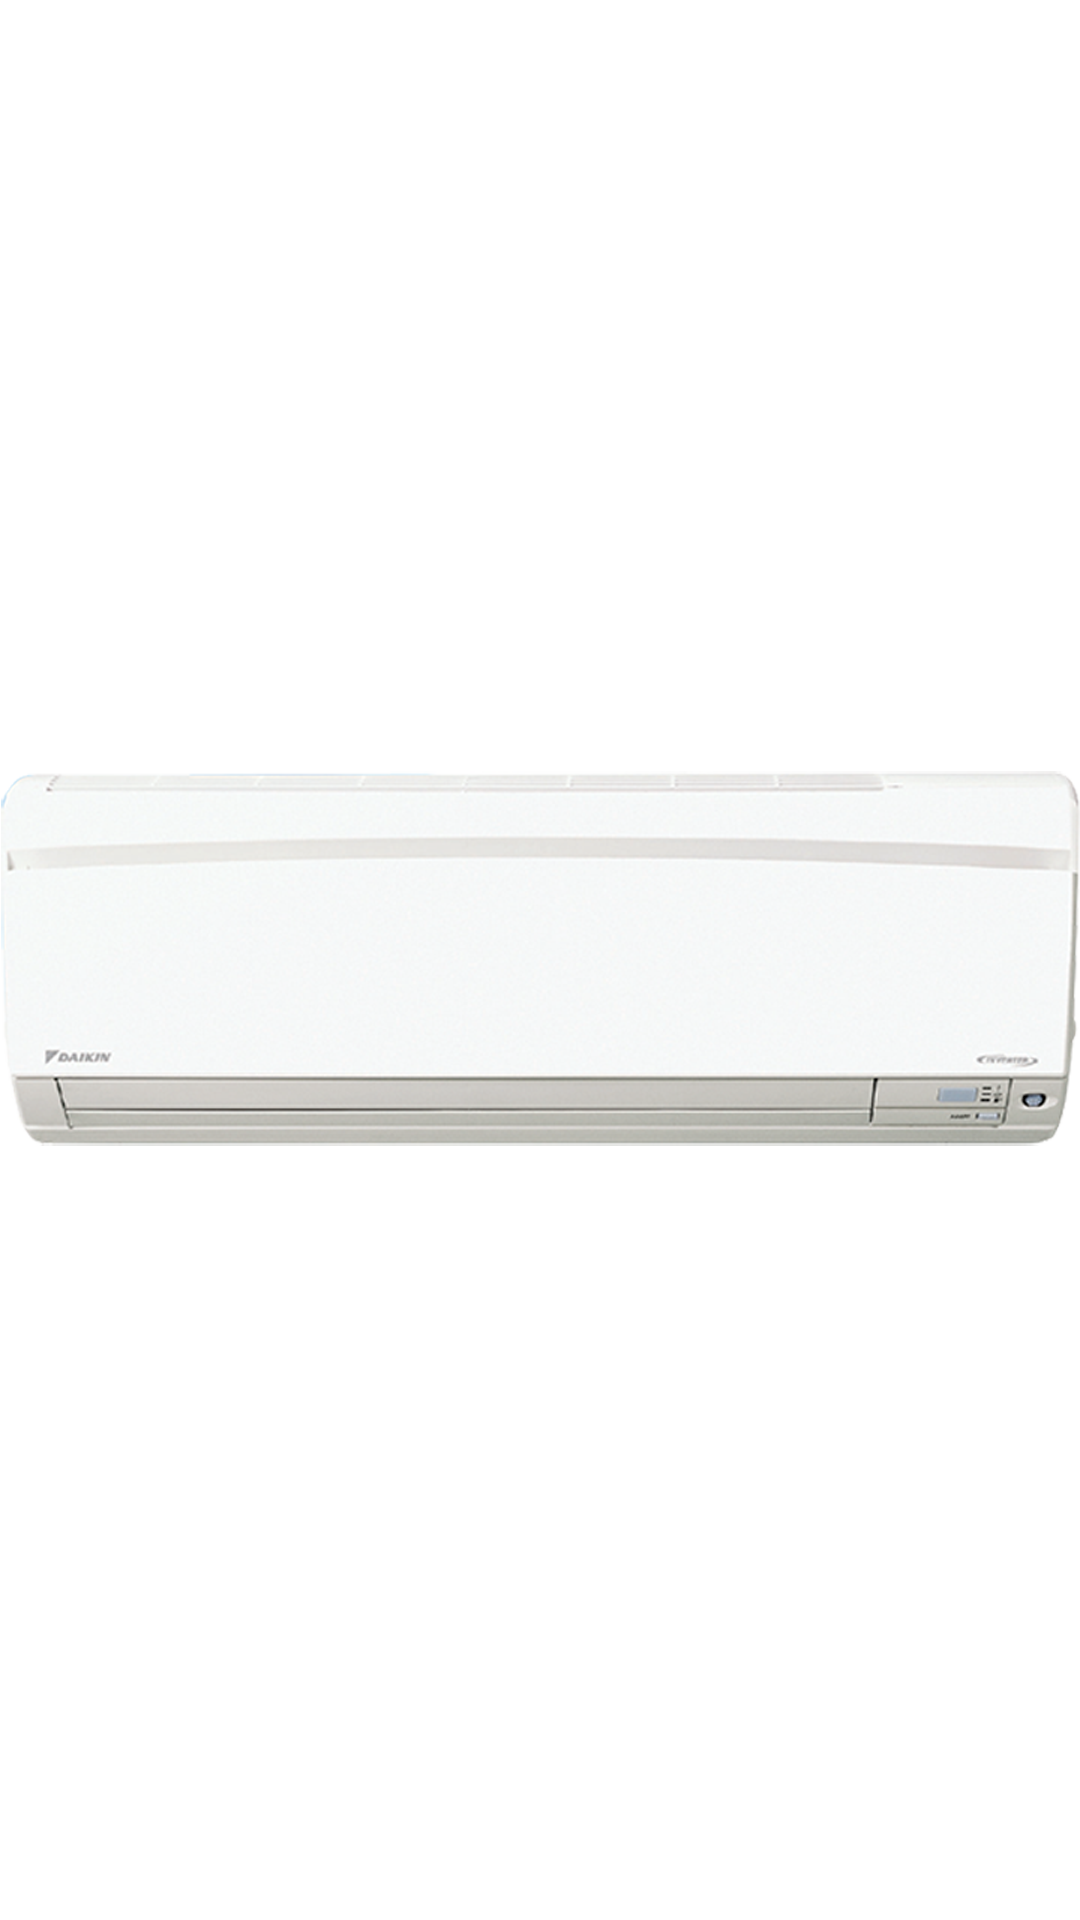 Daikin 1.5 Ton Inverter FTXS50FVMA Split AC Image